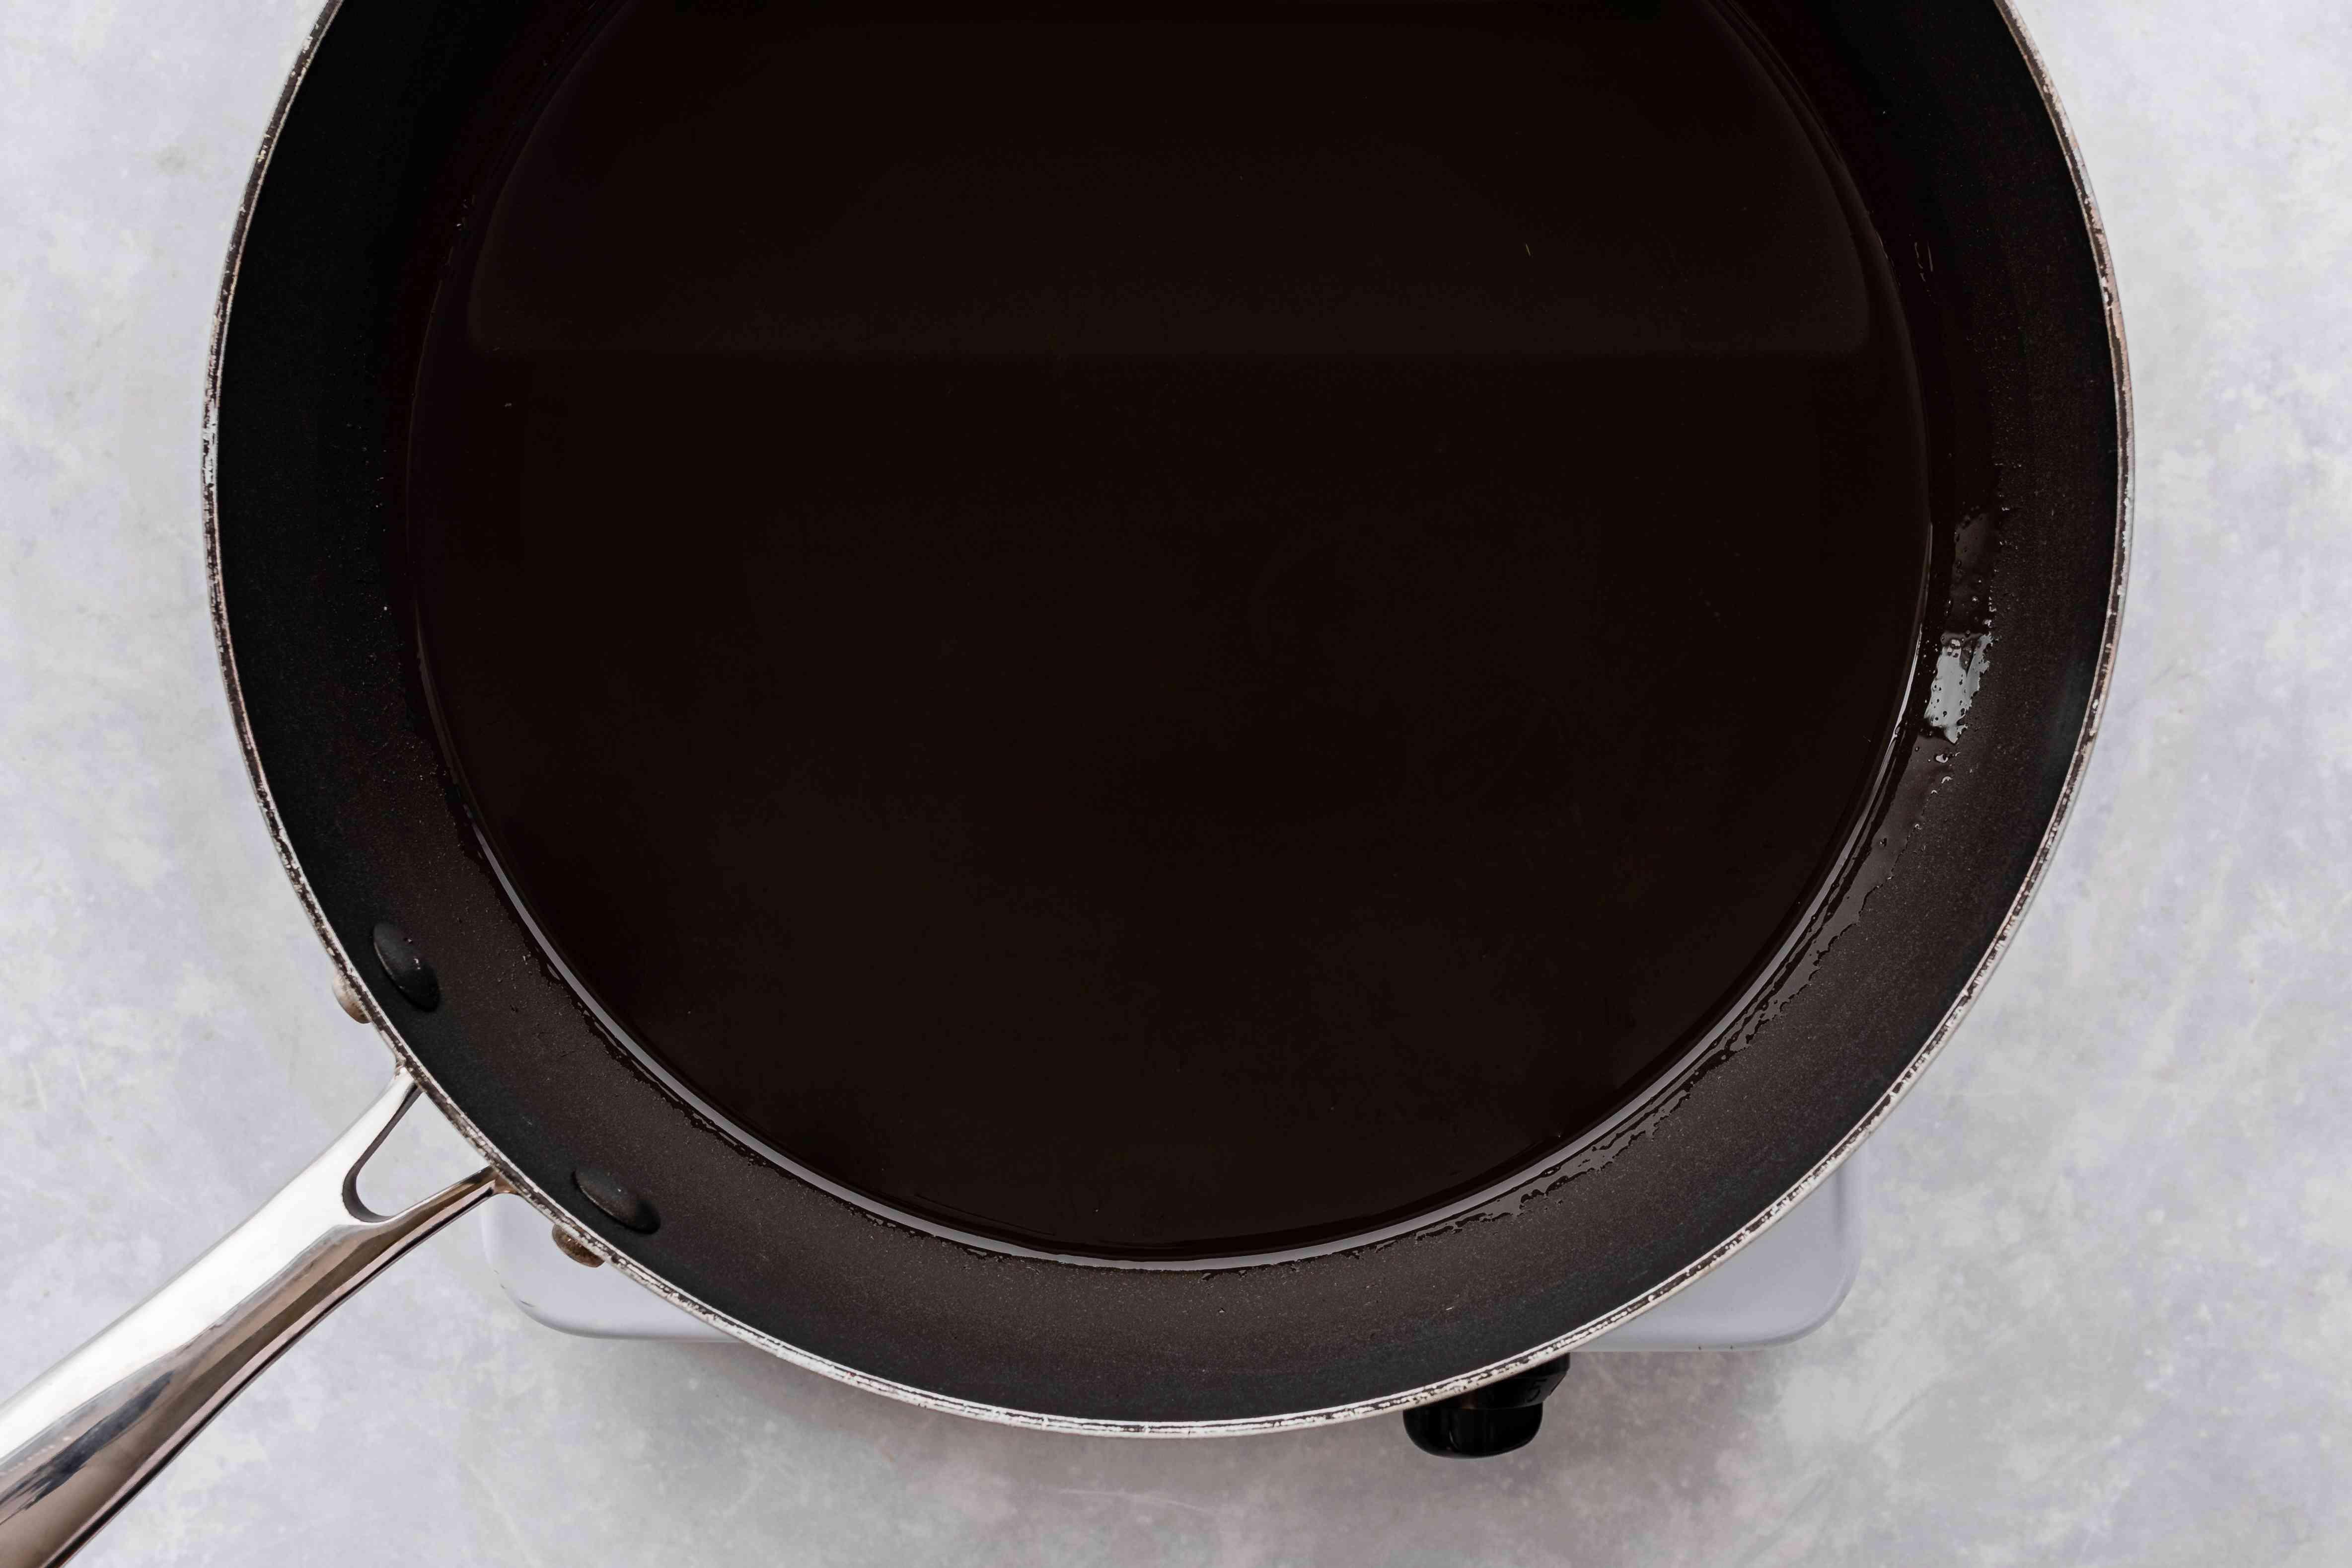 Oil heating in a pan